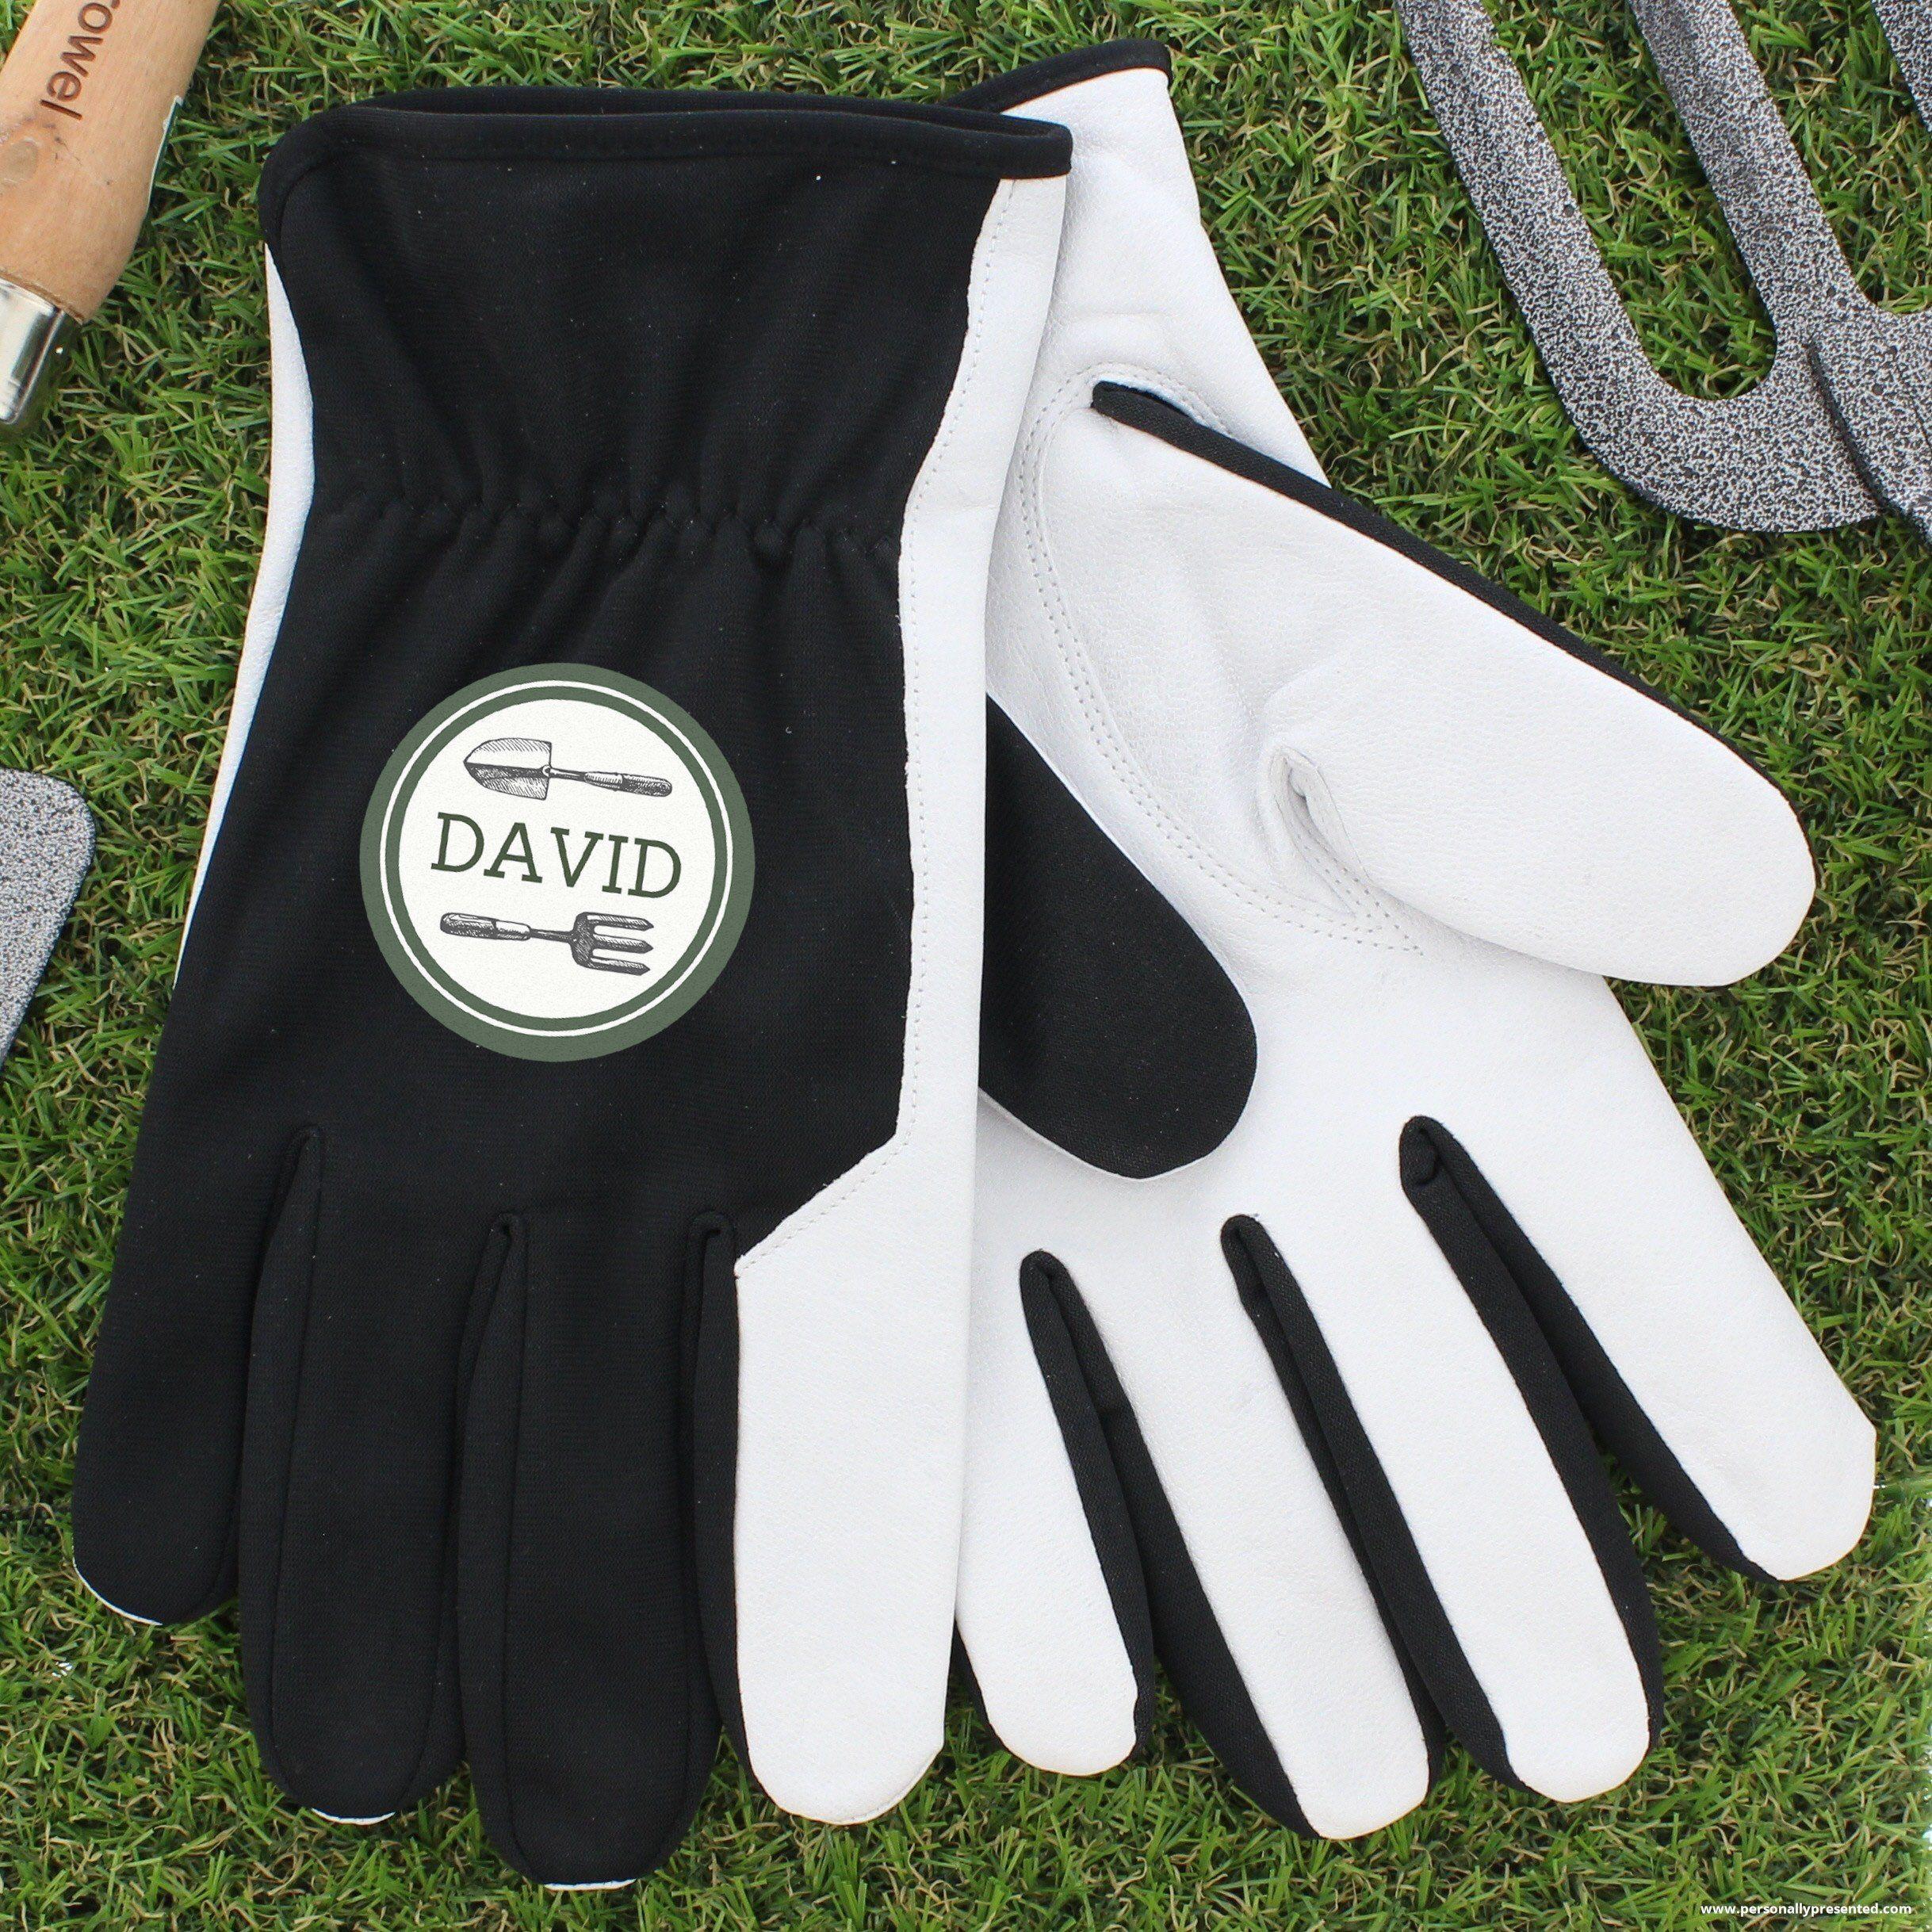 Personalised Gardener Large Black Gardening Gloves Gift For Him Dad Grandpa Idea